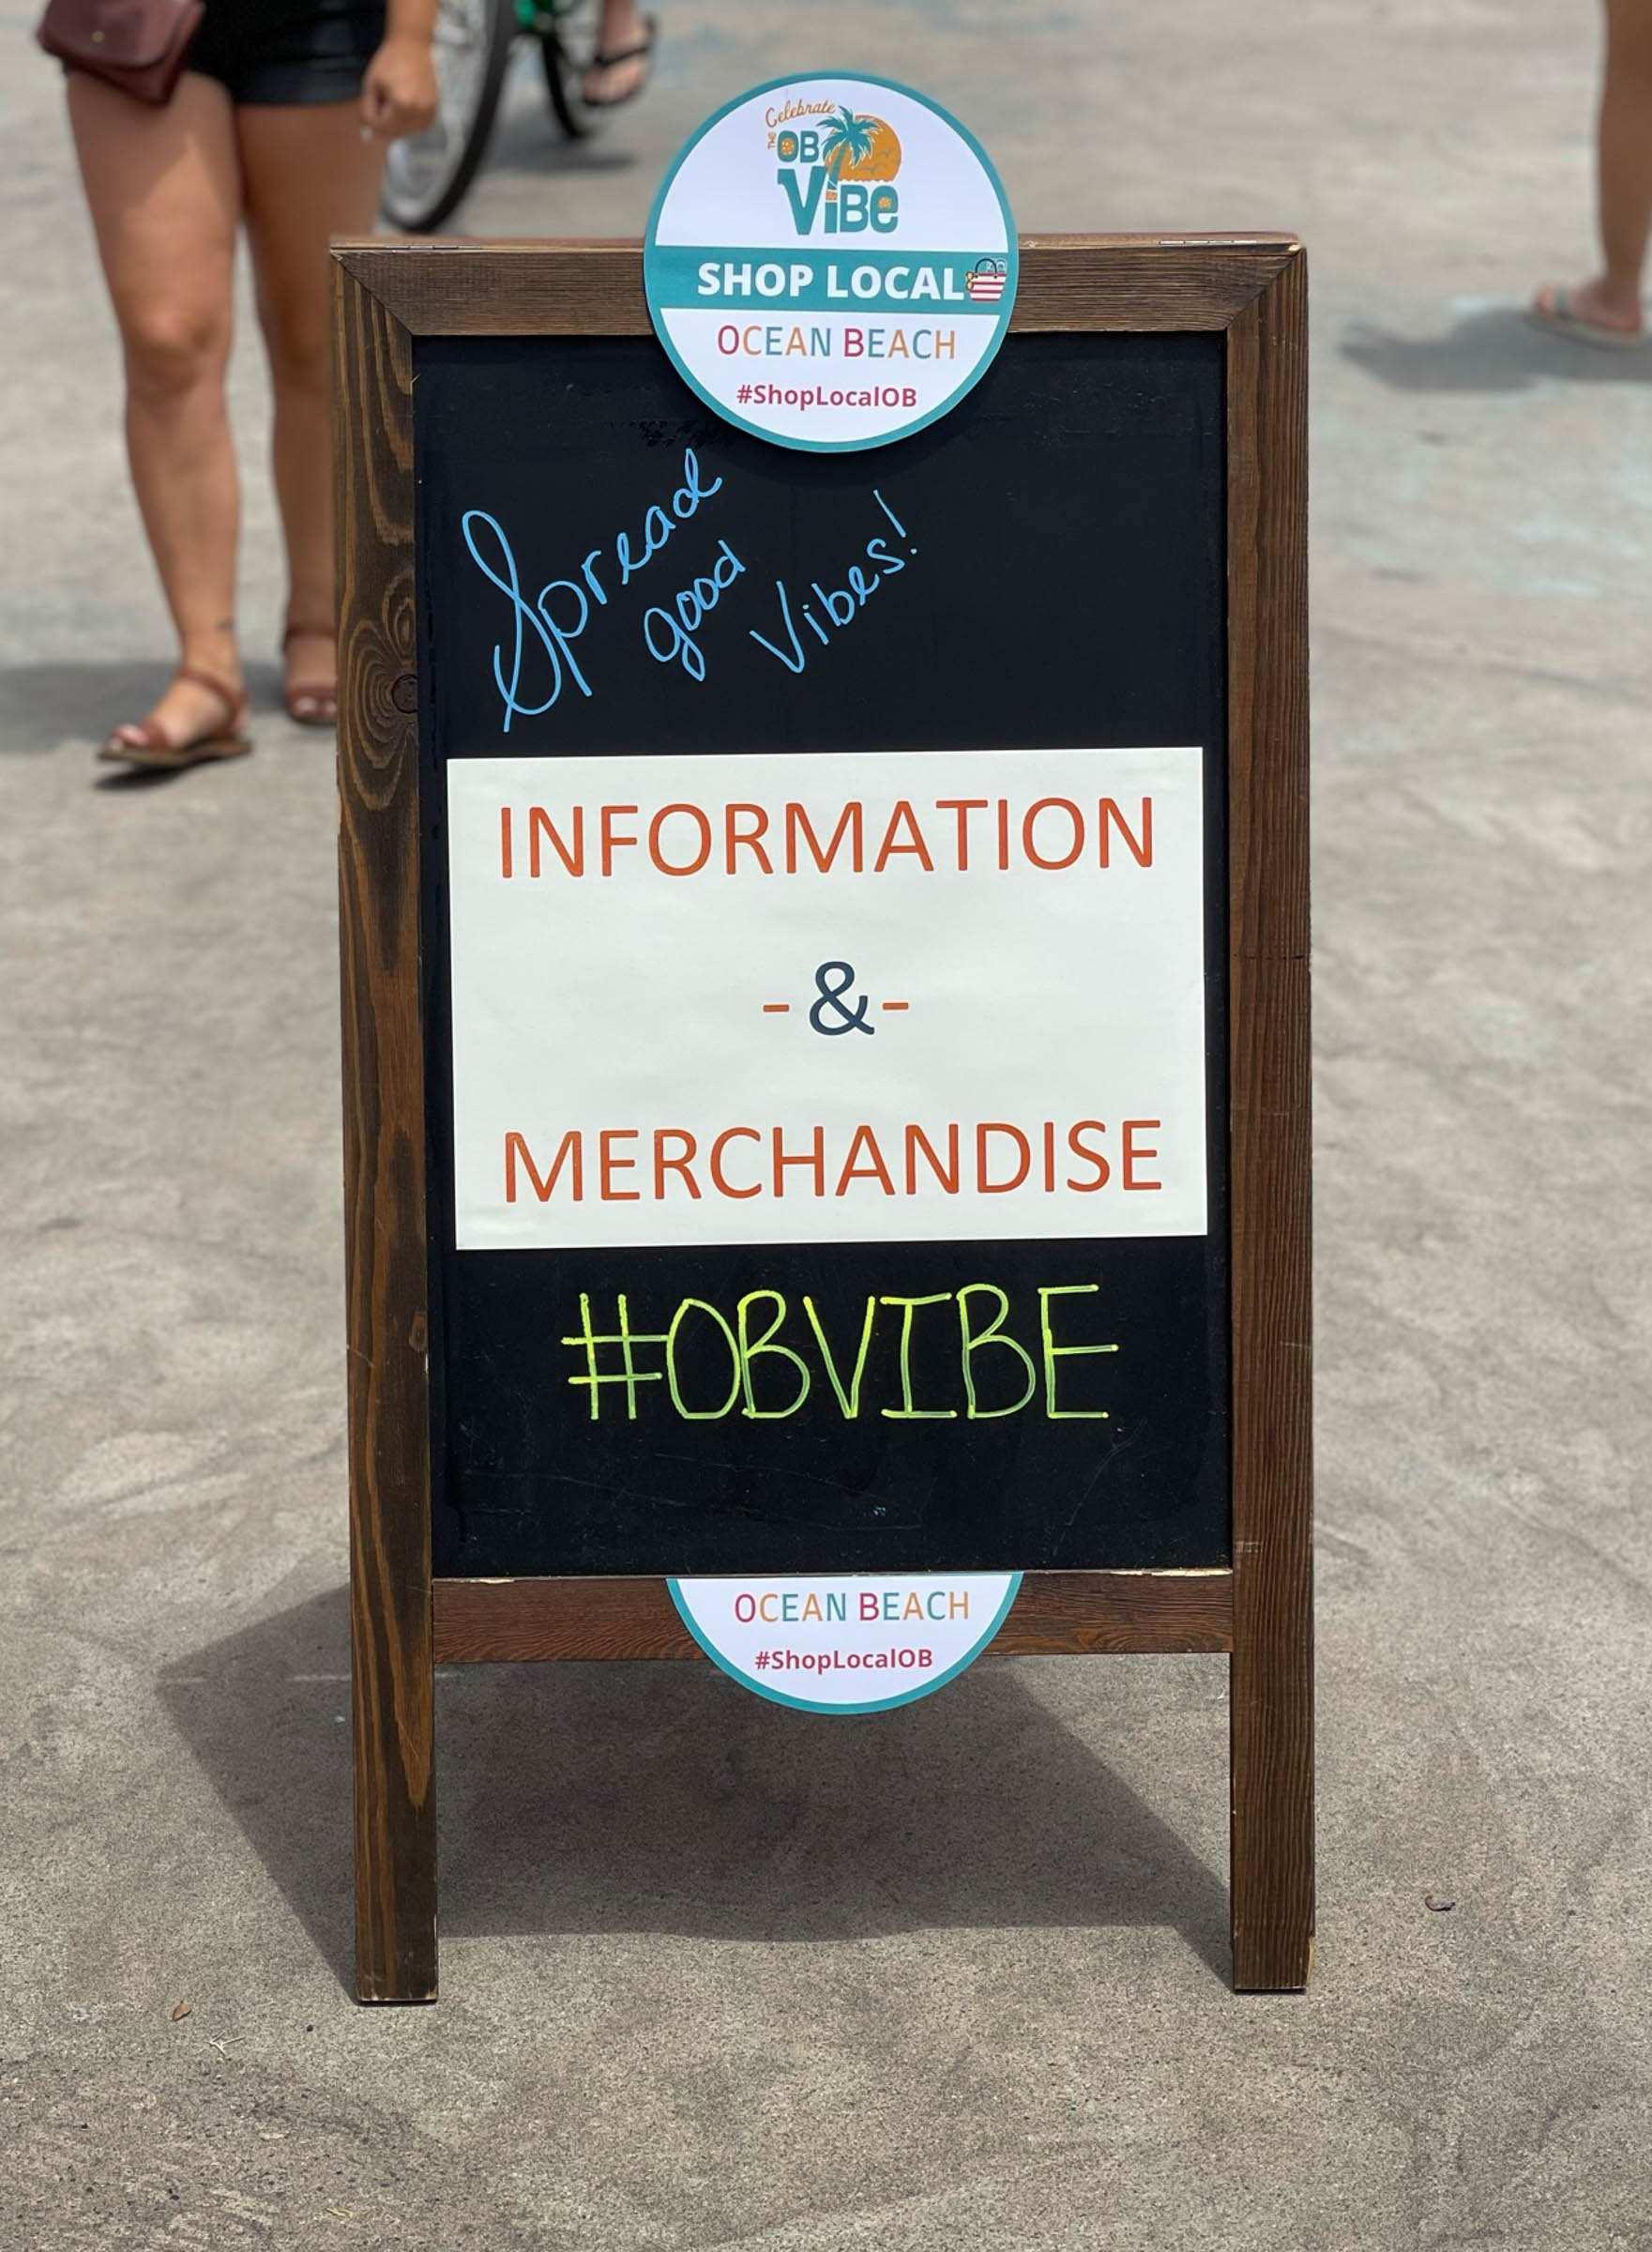 Photo of: OB Vibe Event Photos